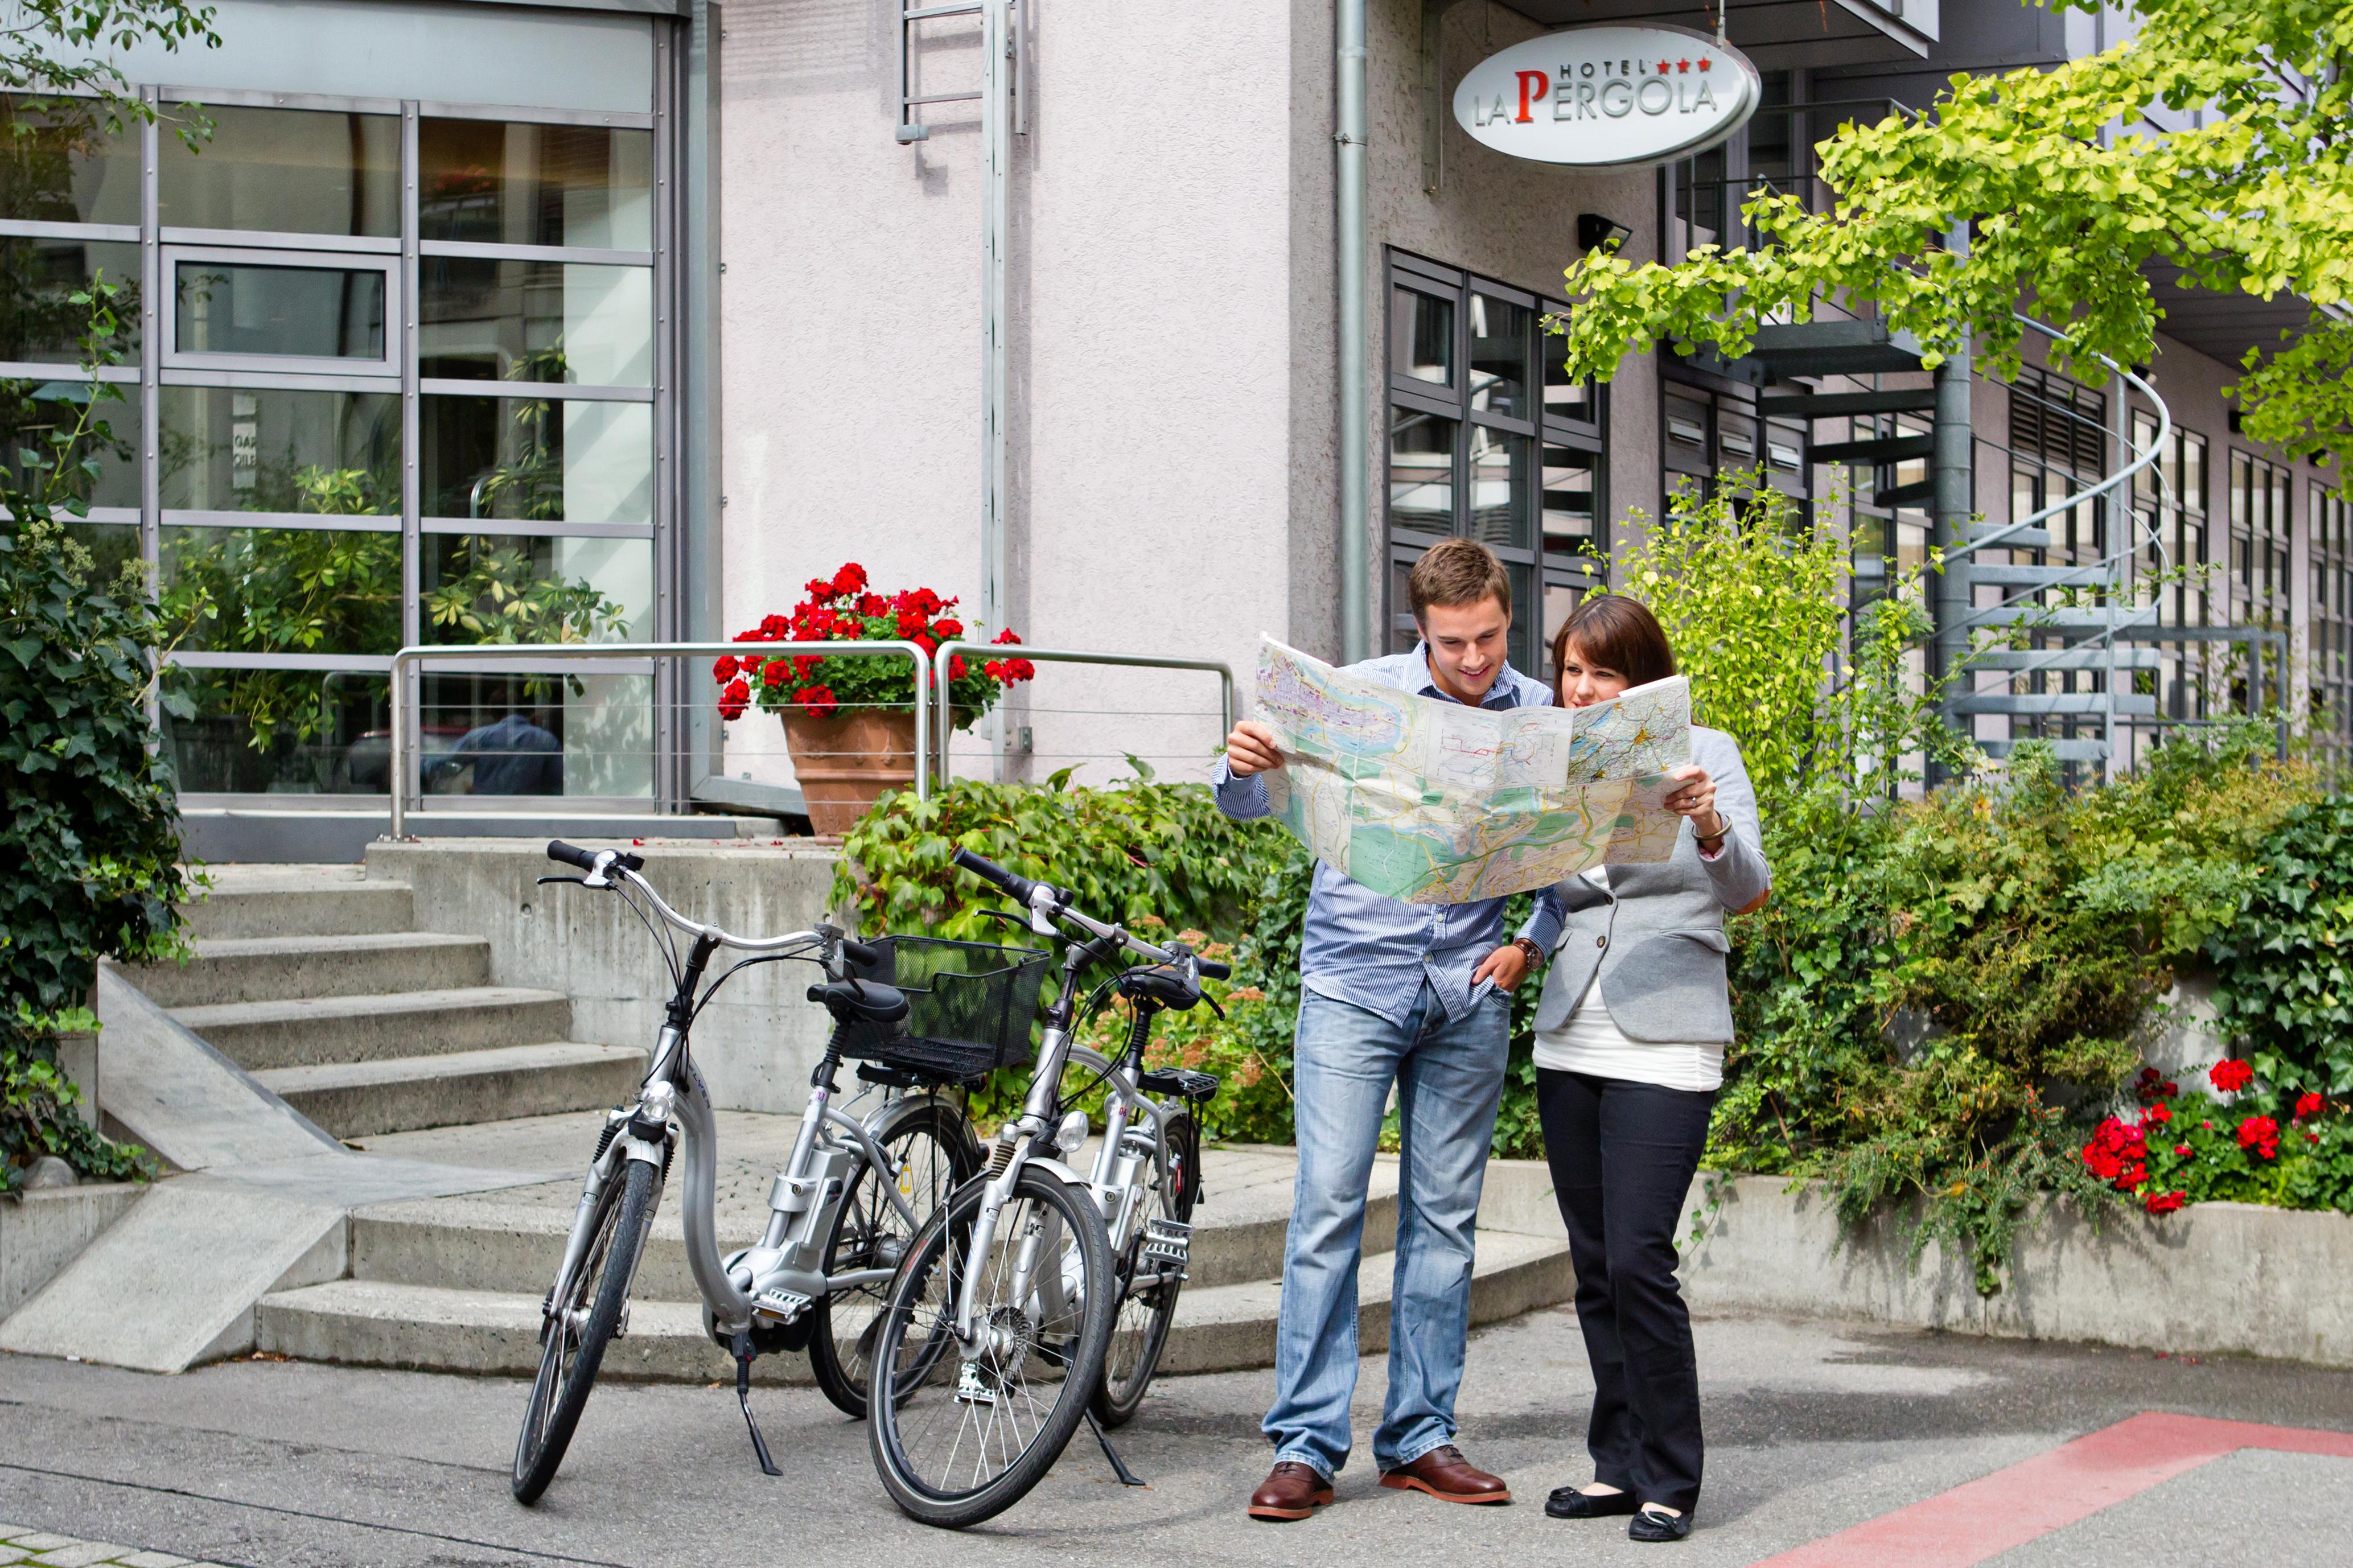 La Pergola, Bern